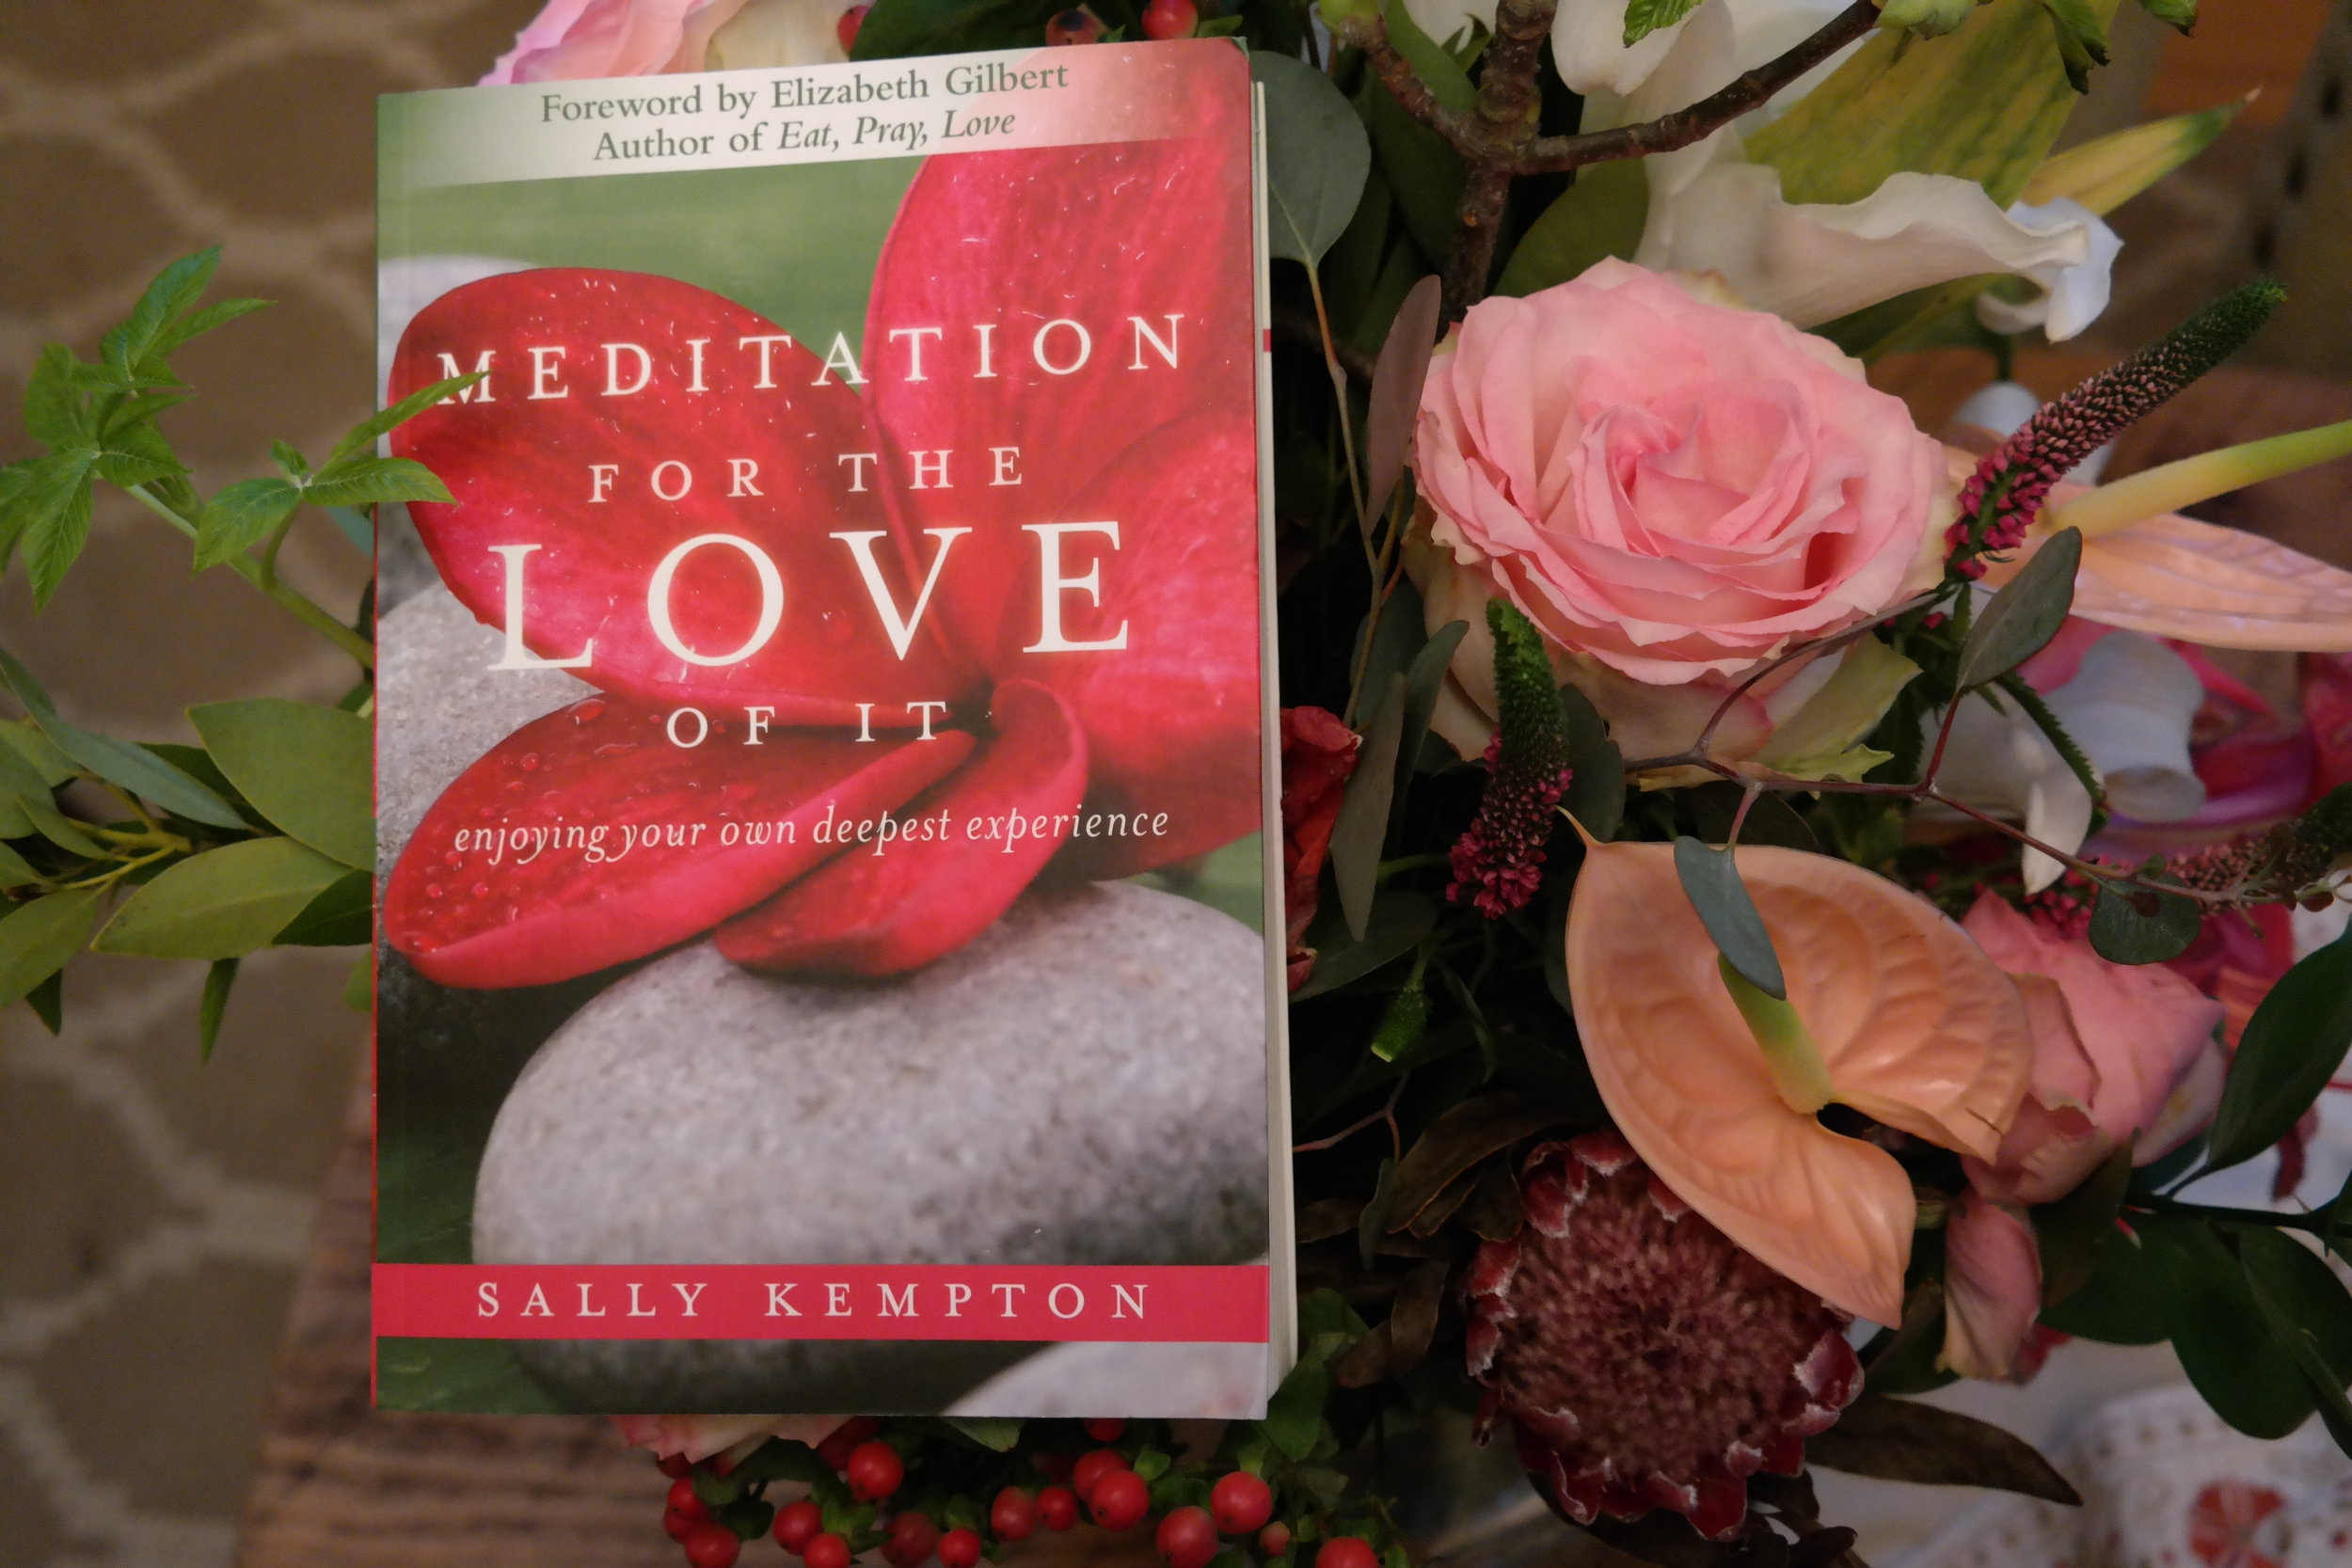 Meditation for the Love of it Sally Kempton